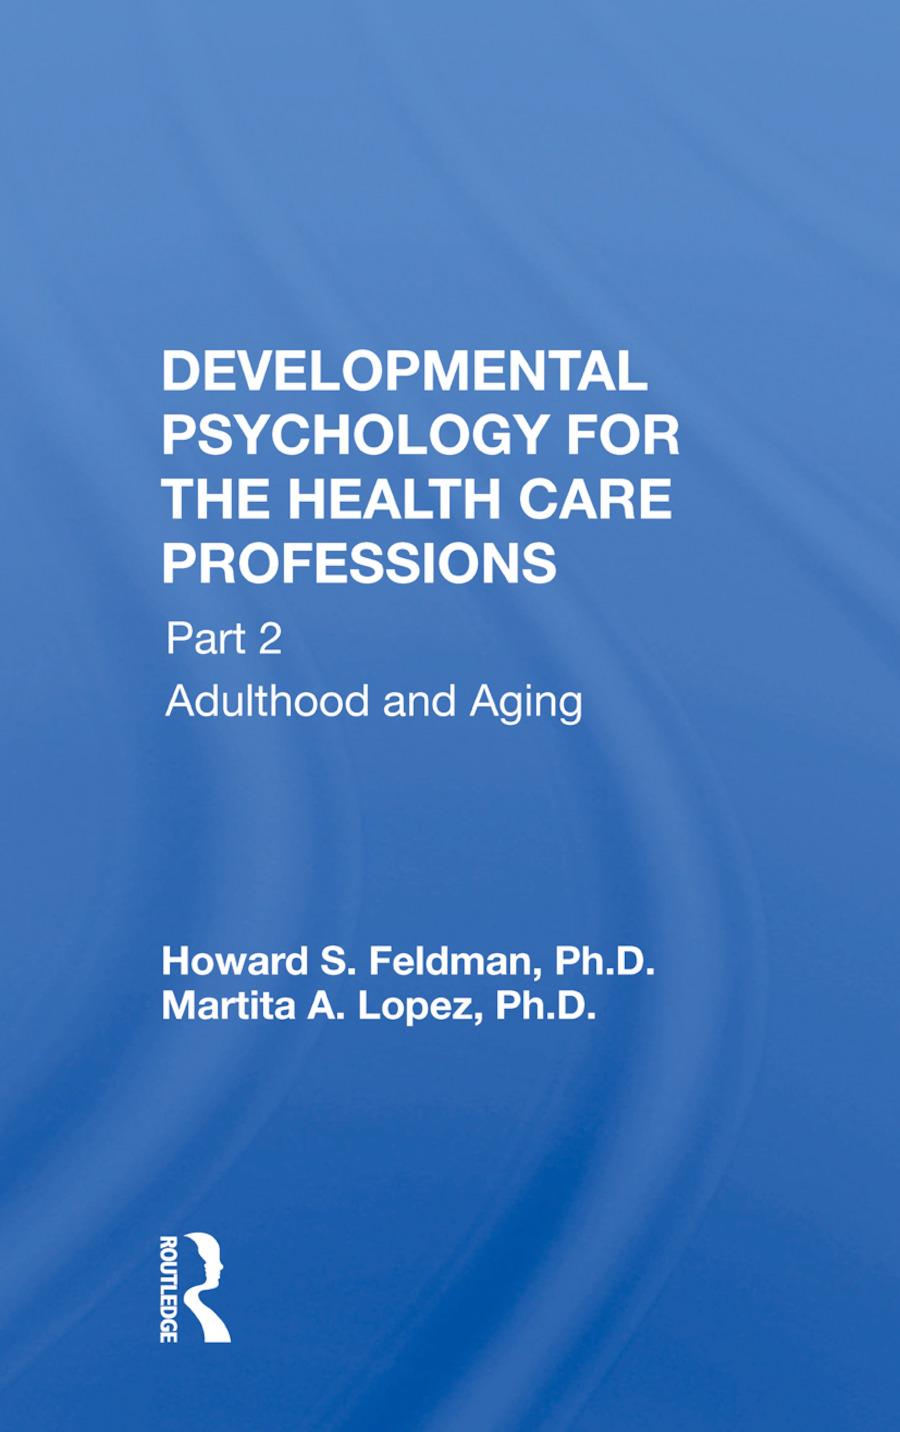 Developmental Psychology For The Health Care Professions: Part 1: Prenatal Through Adolescent Development, 1st Edition (e-Book) book cover